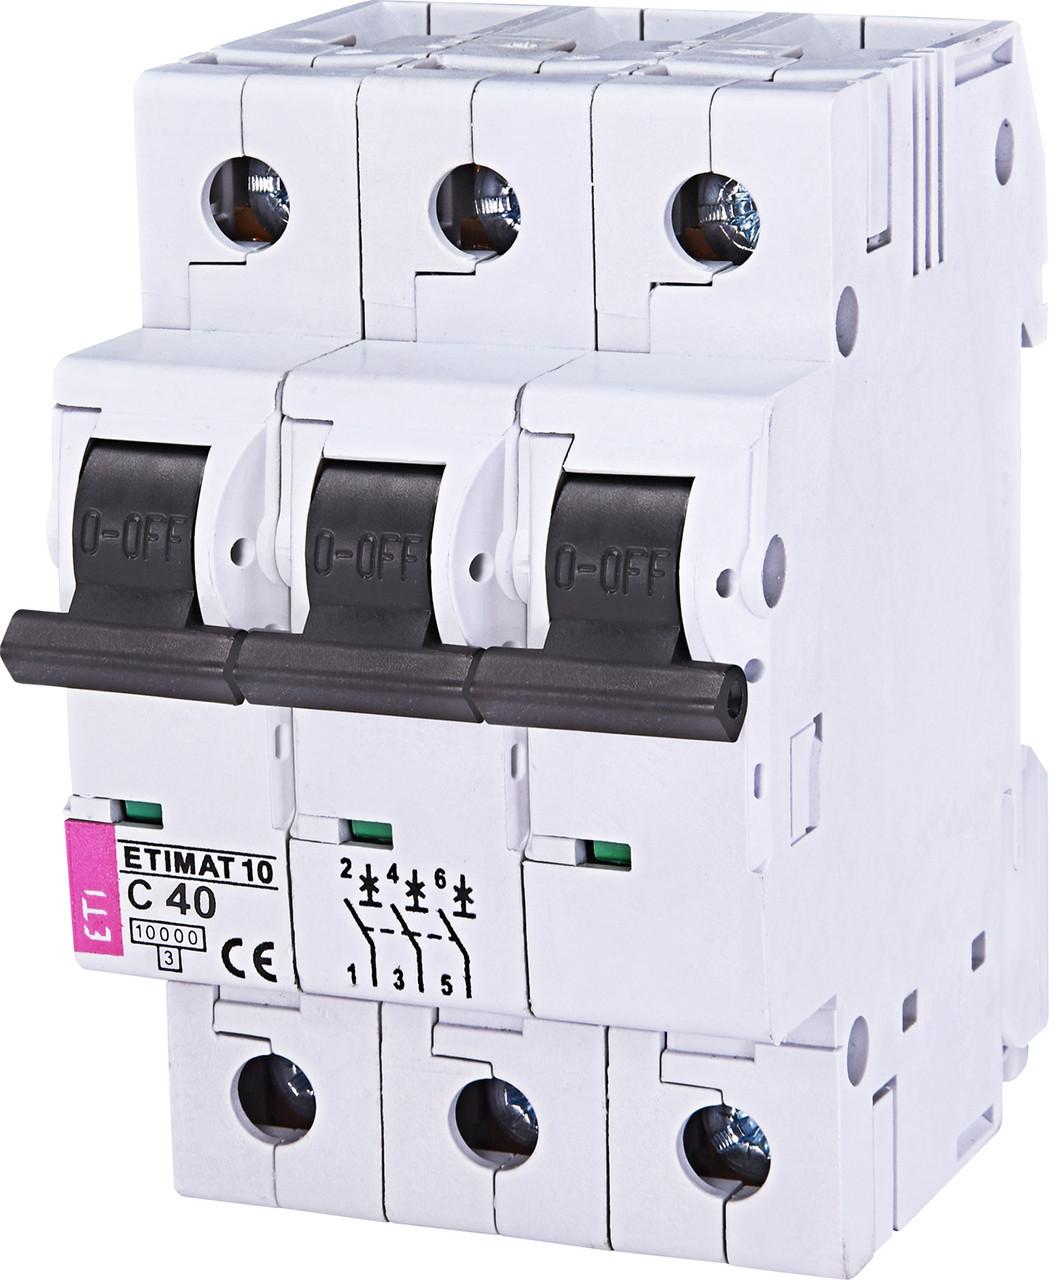 Авт. вимикач ETI ETIMAT 10 3p 40A C 10kA 2135720